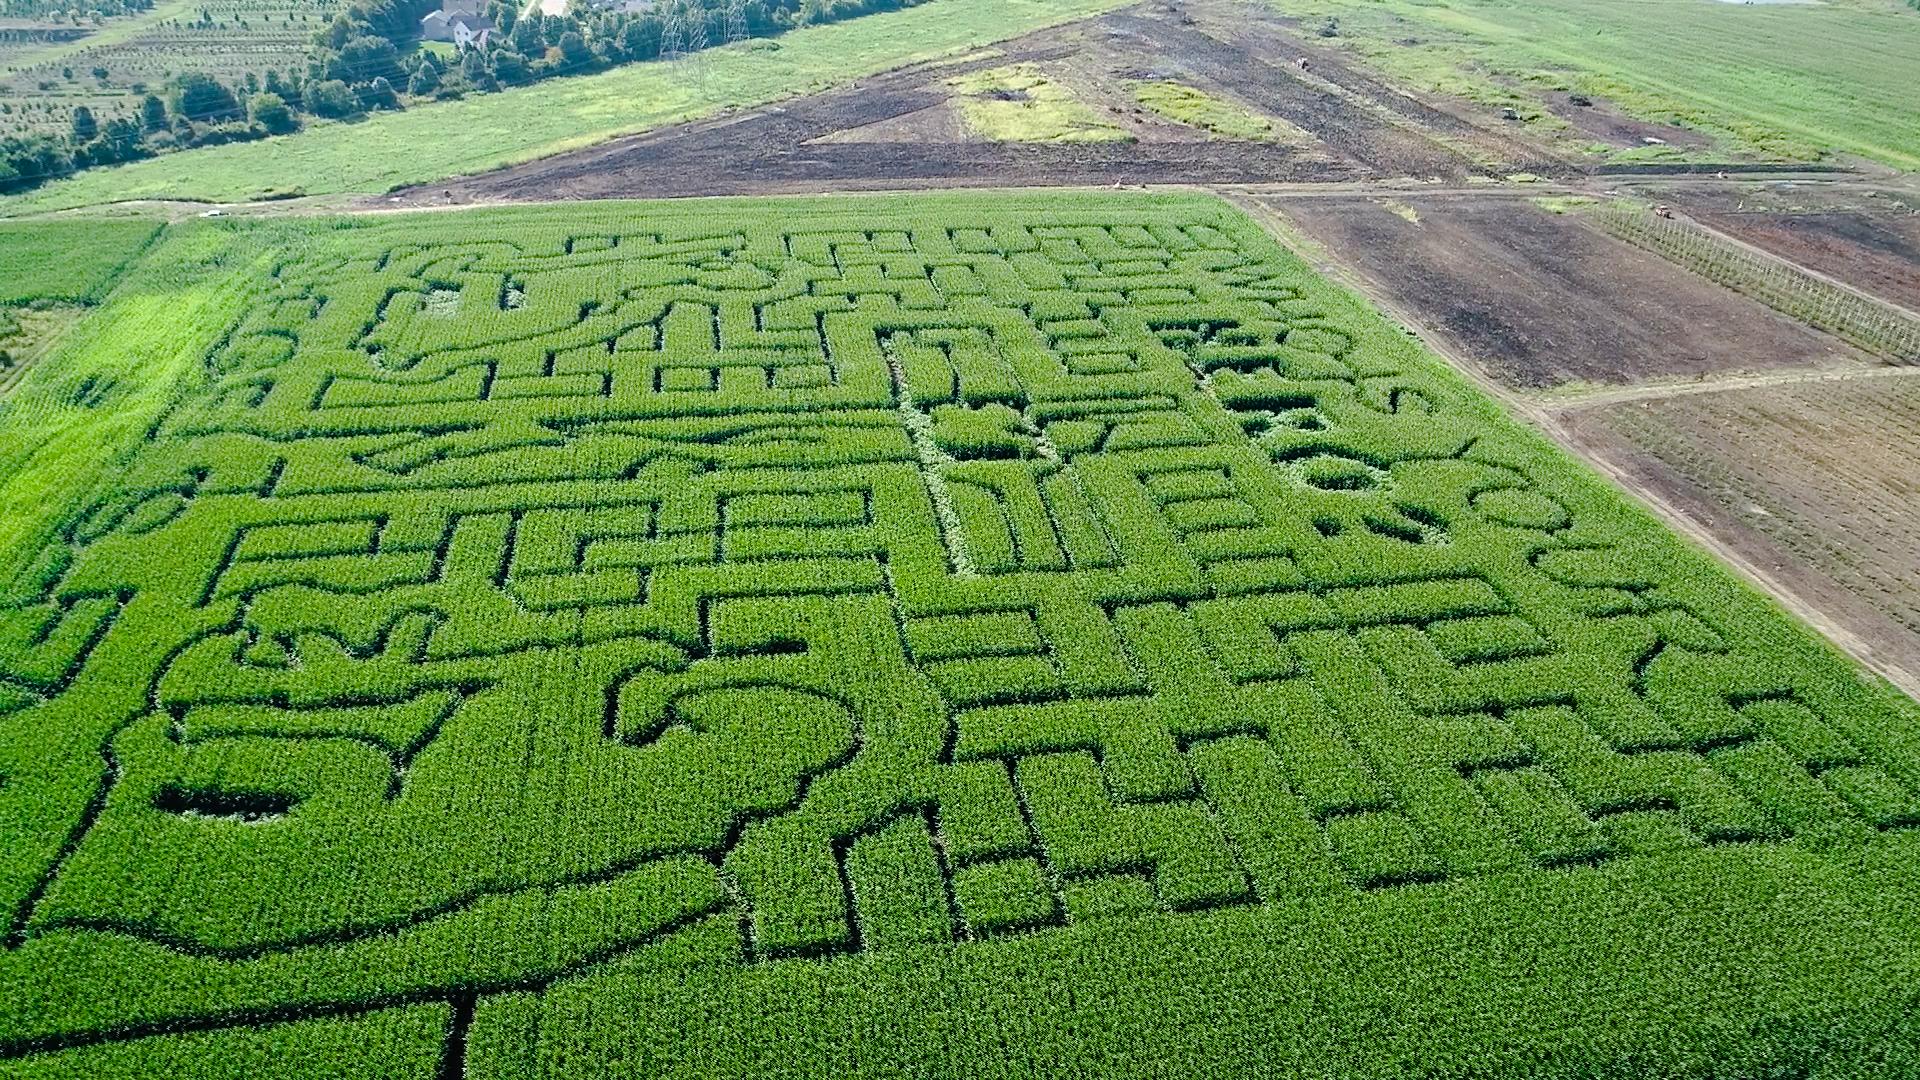 seigel's corn maze